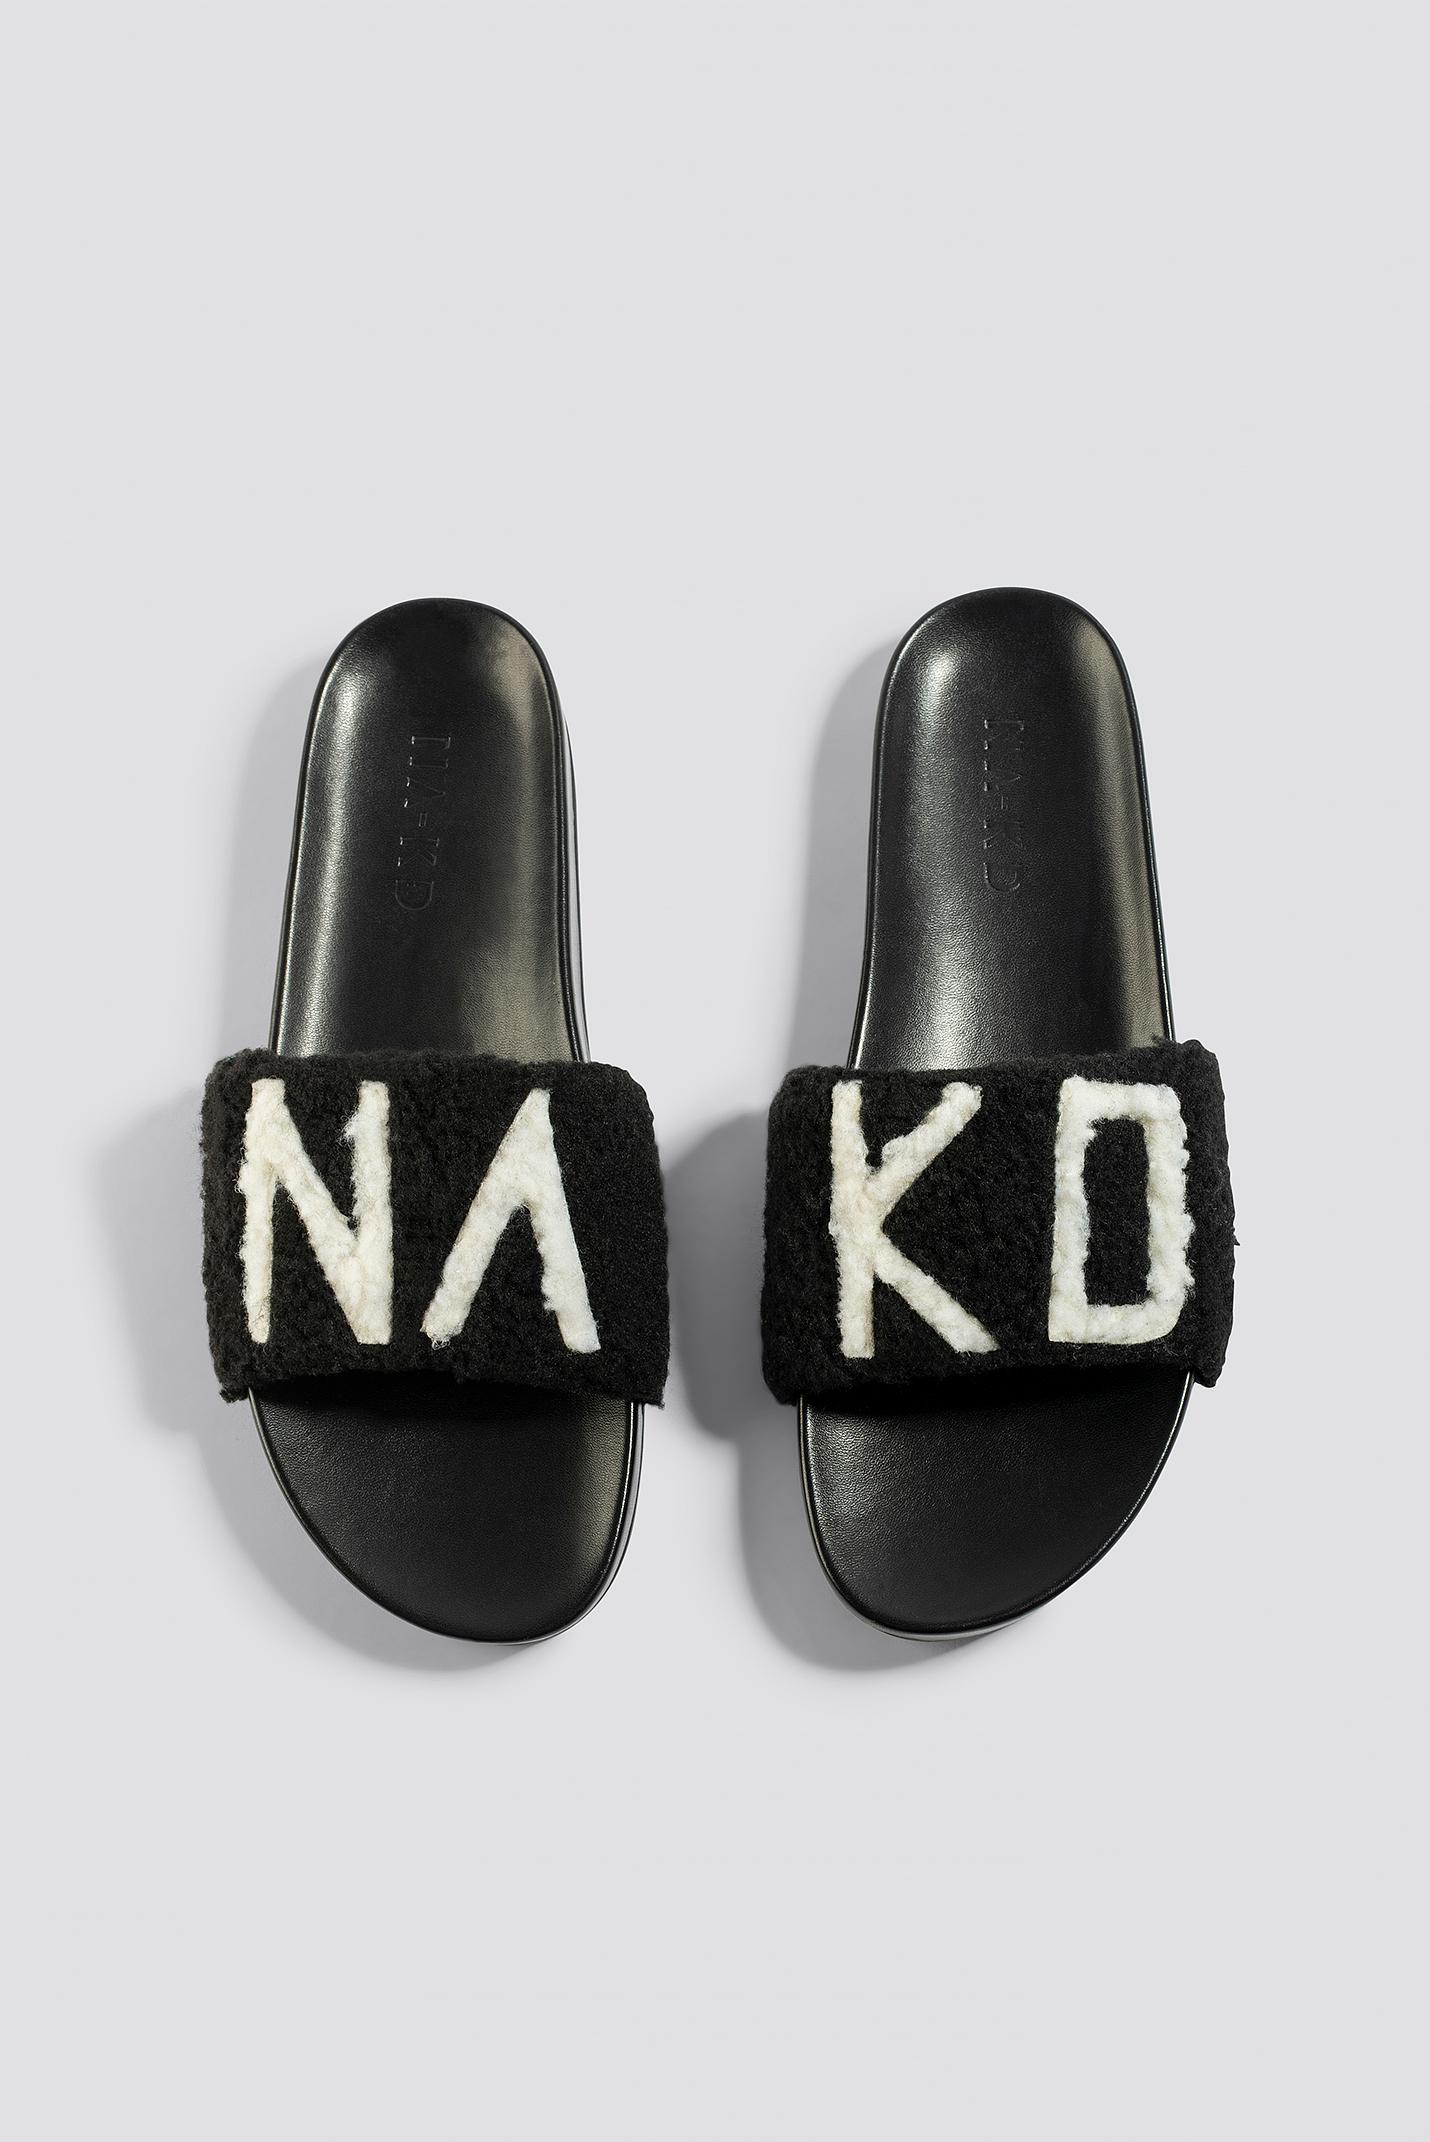 FLUFFY NA-KD SLIPPERS - BLACK